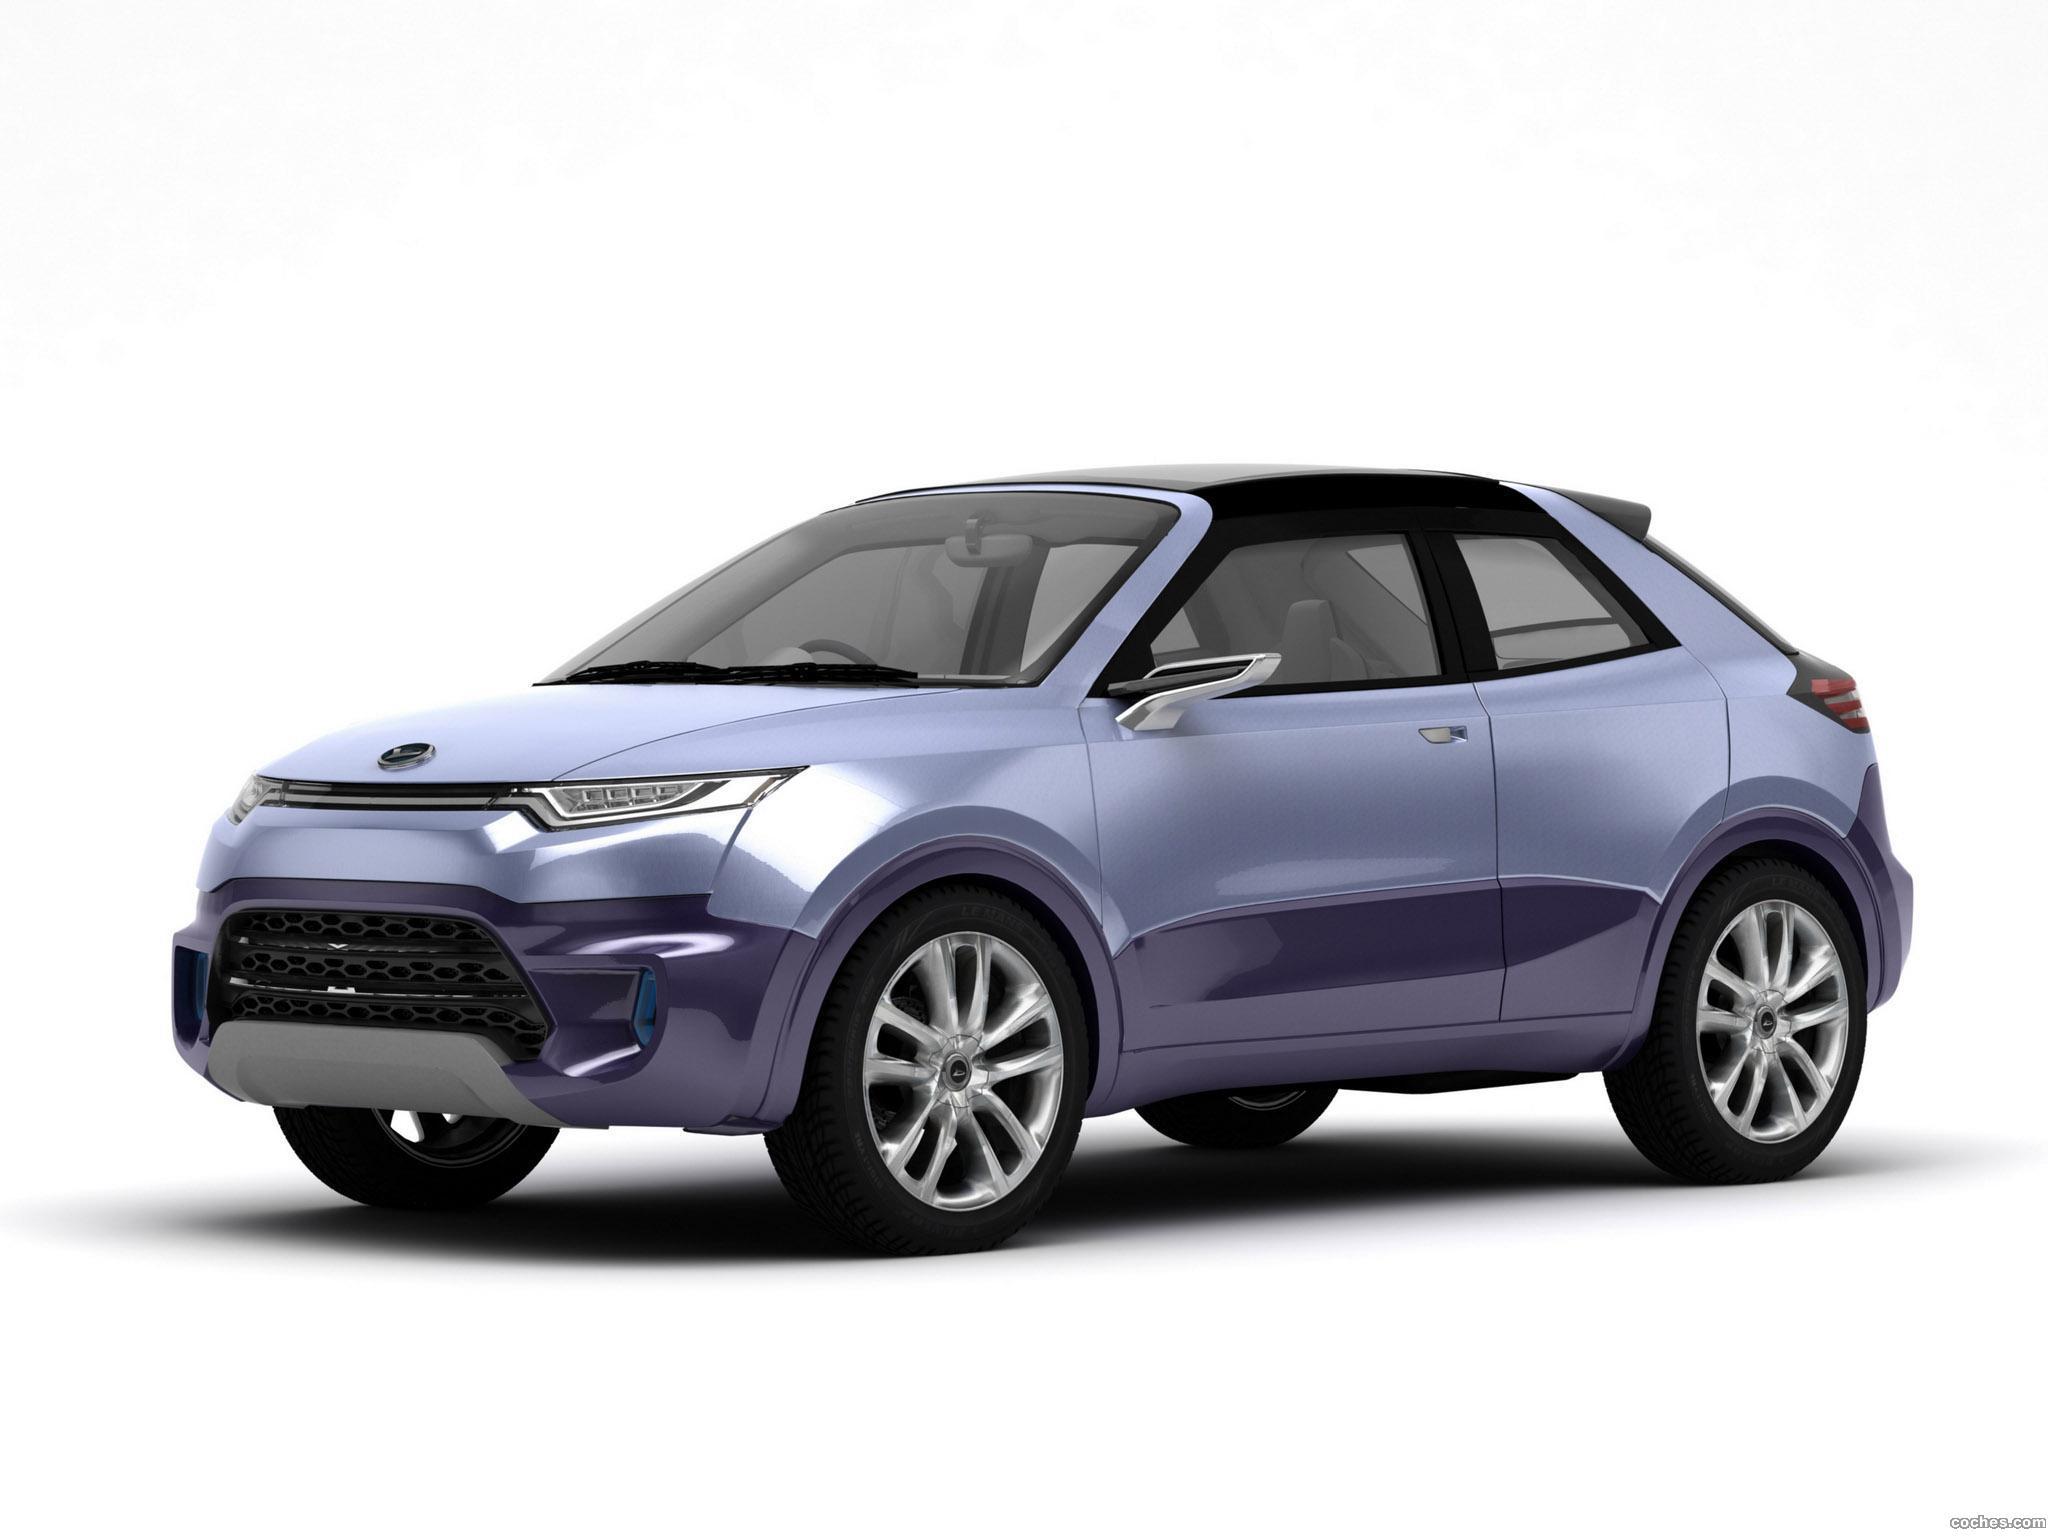 Daihatsu Cuv Concept R on Kia Sedona Radio Wiring Diagram